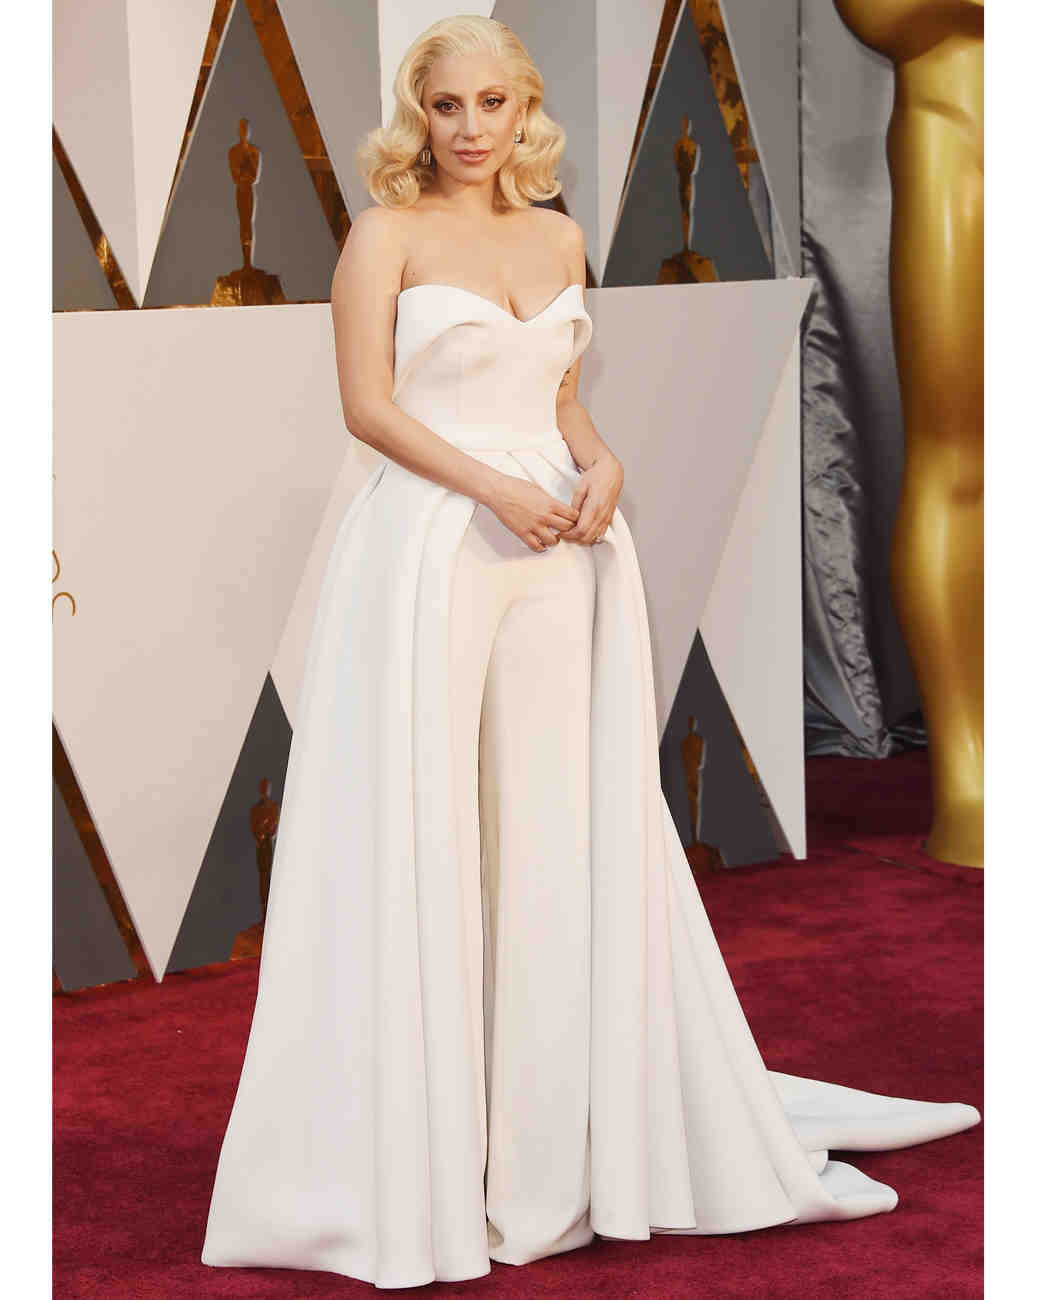 2016-oscars-dresses-lady-gaga-0216.jpg